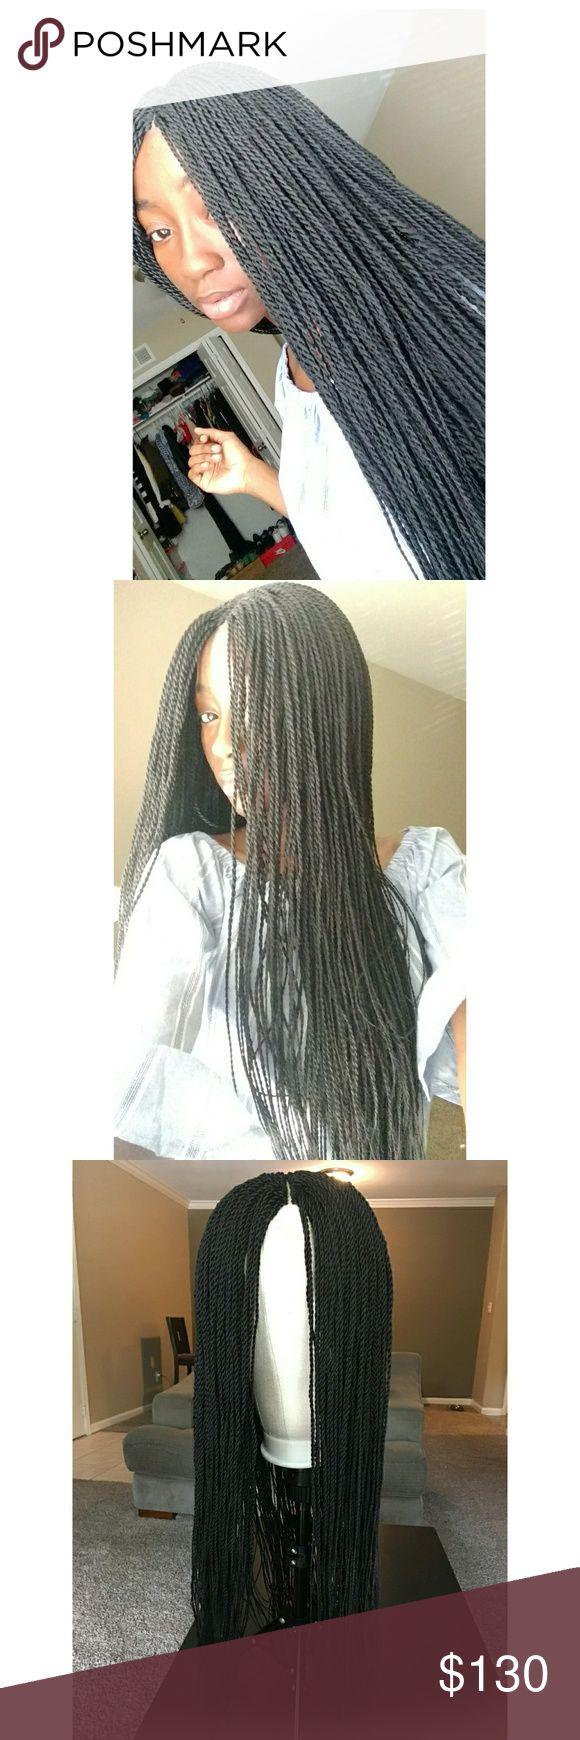 Black Senegalese Twist Braided Wig 24 Inch Senegalese Twist Wig in color 1B. Mad…